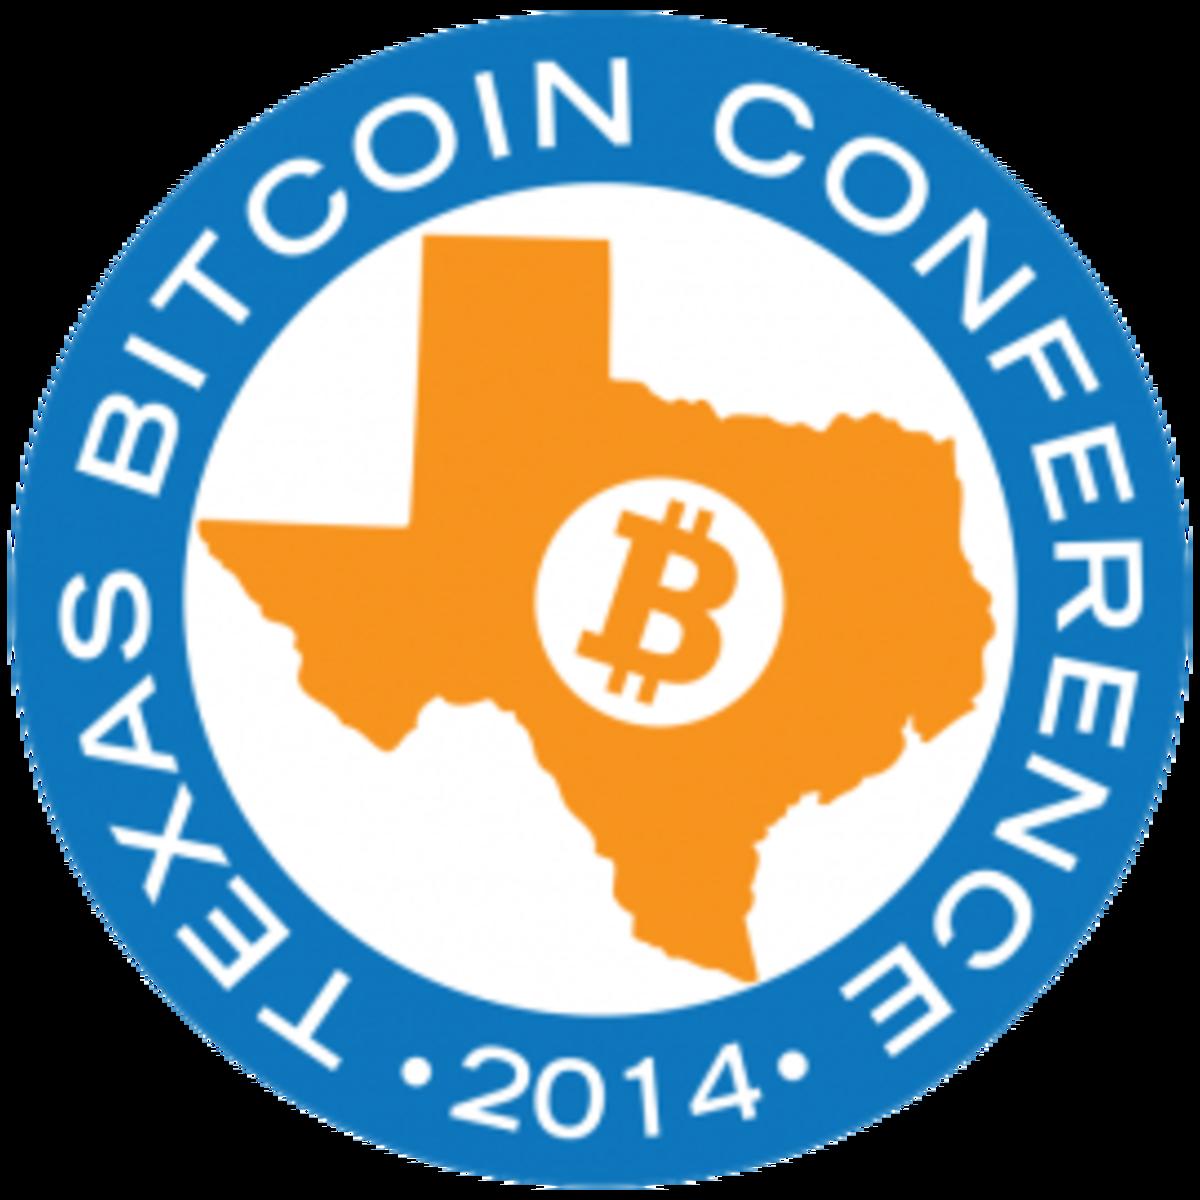 Op-ed - Bitcoin to Shake up Austin